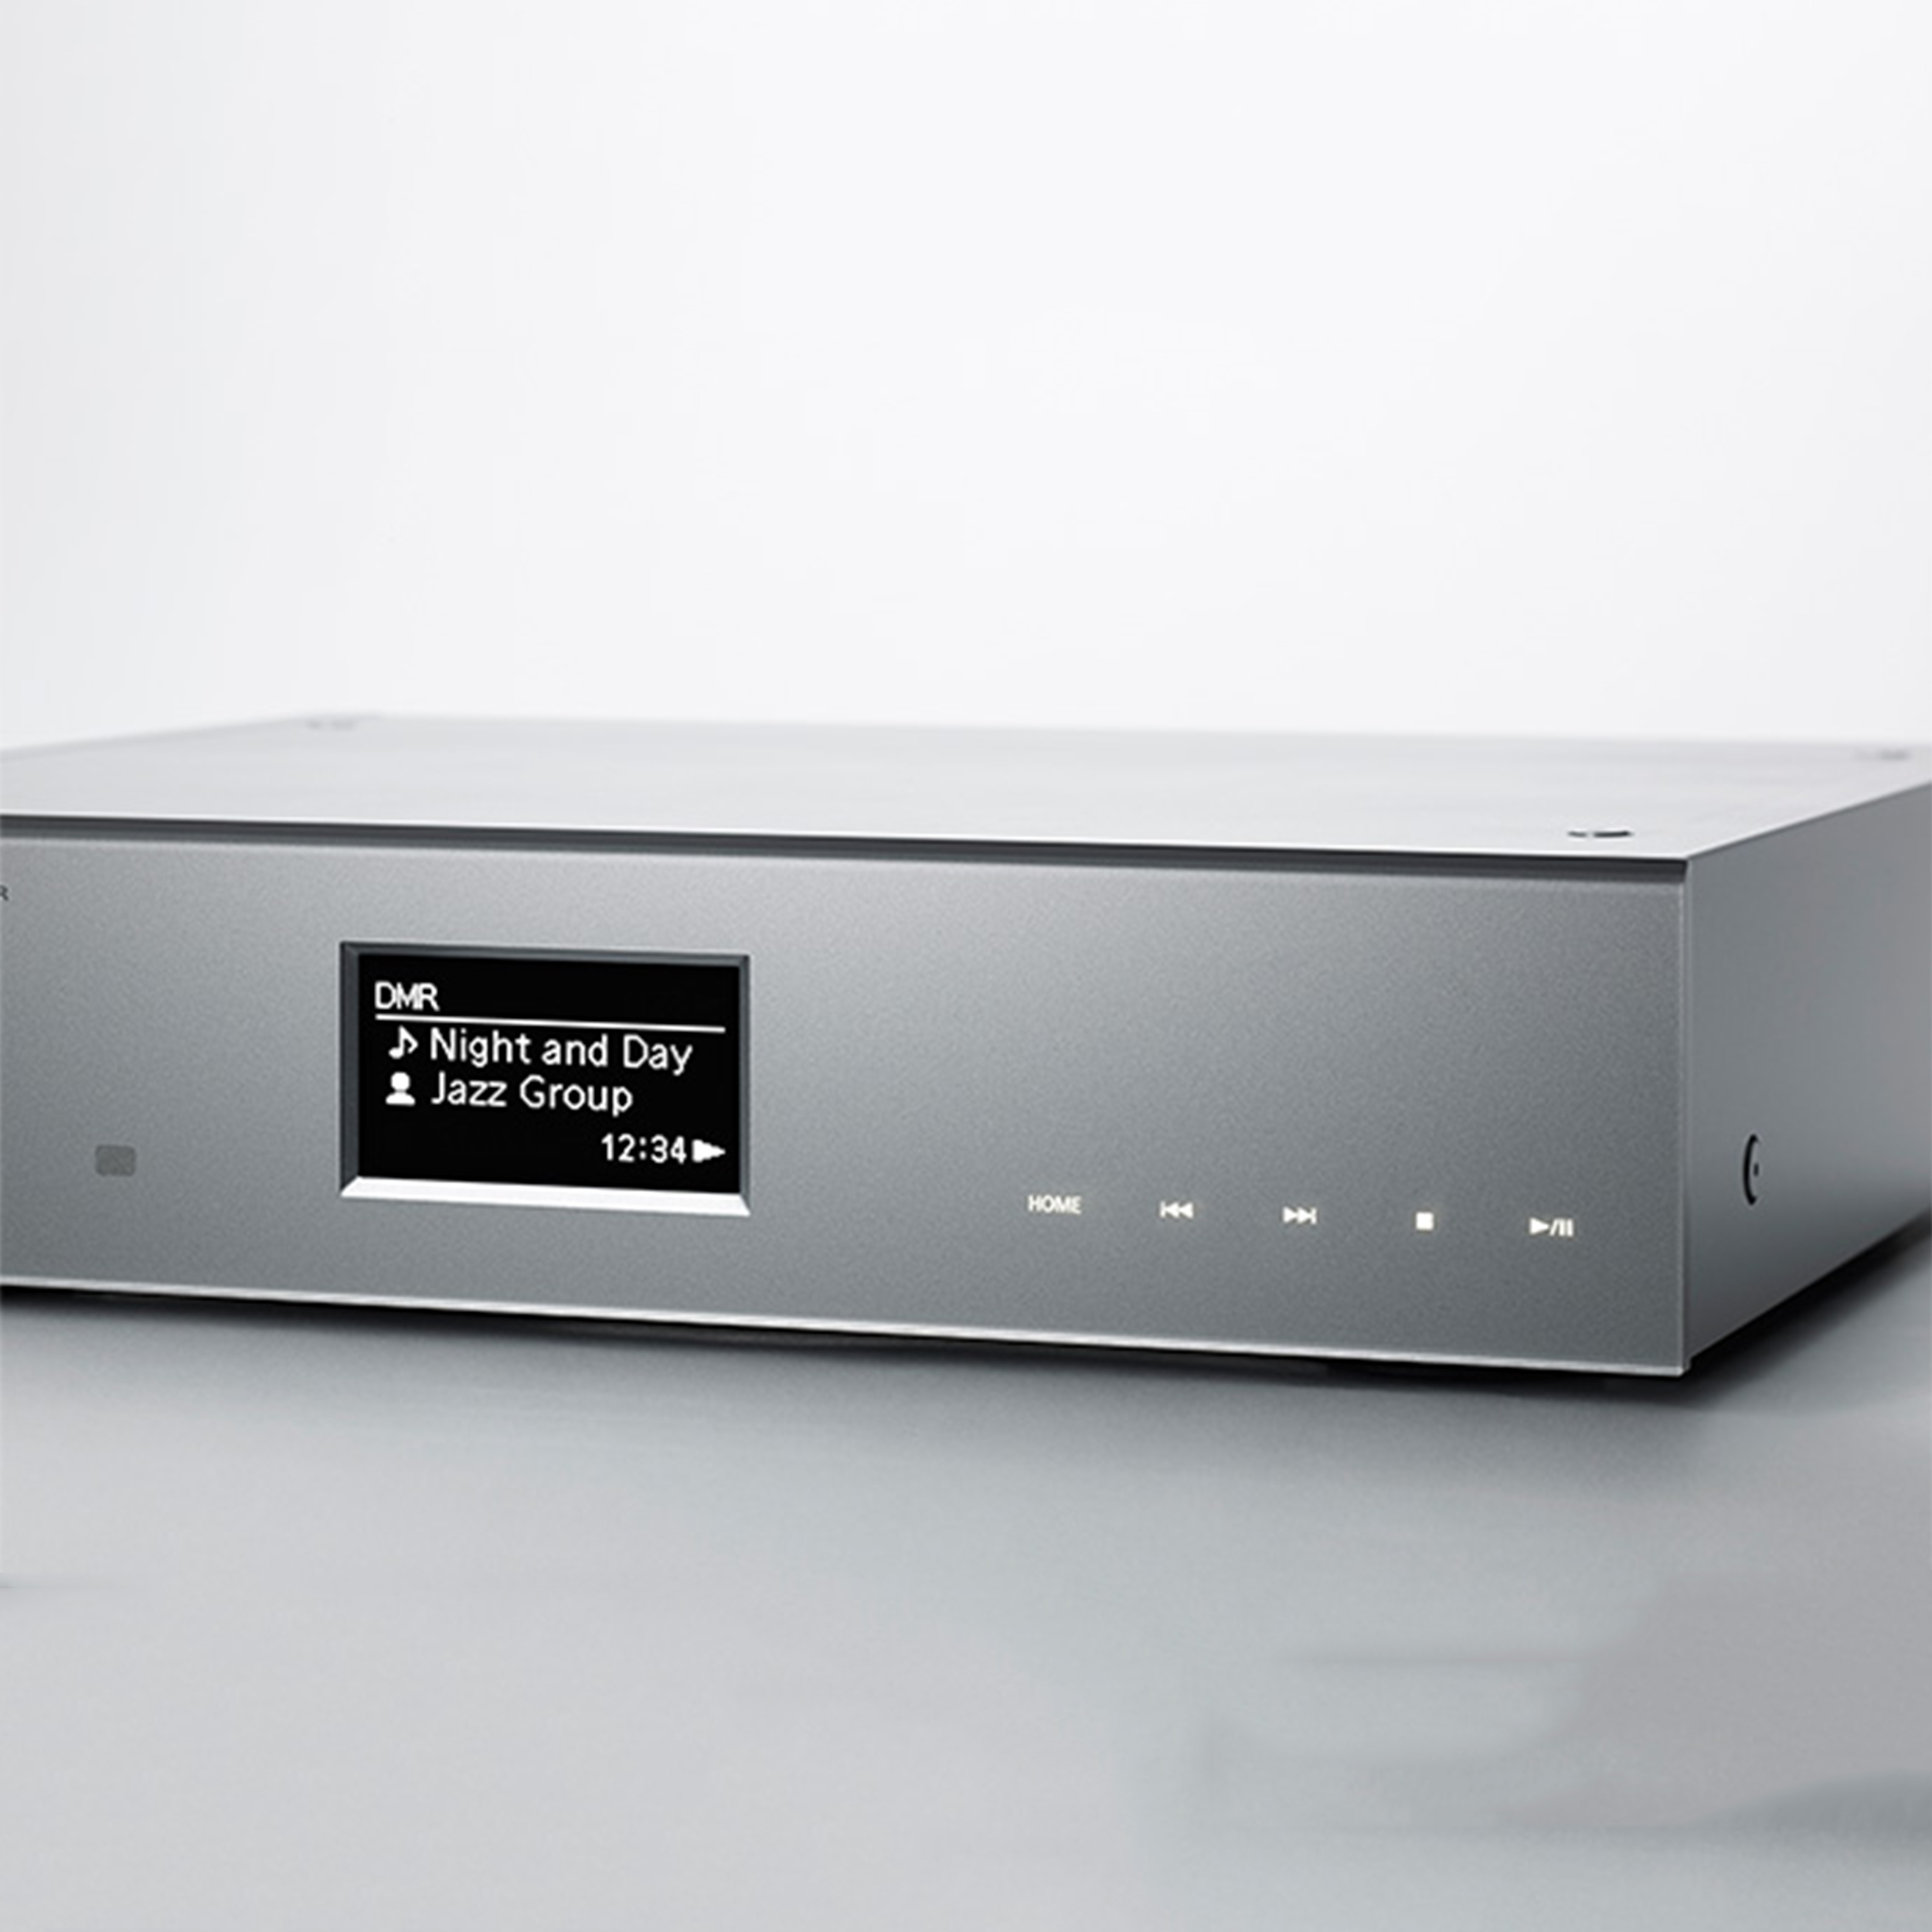 technics st c700 wide screen audio. Black Bedroom Furniture Sets. Home Design Ideas